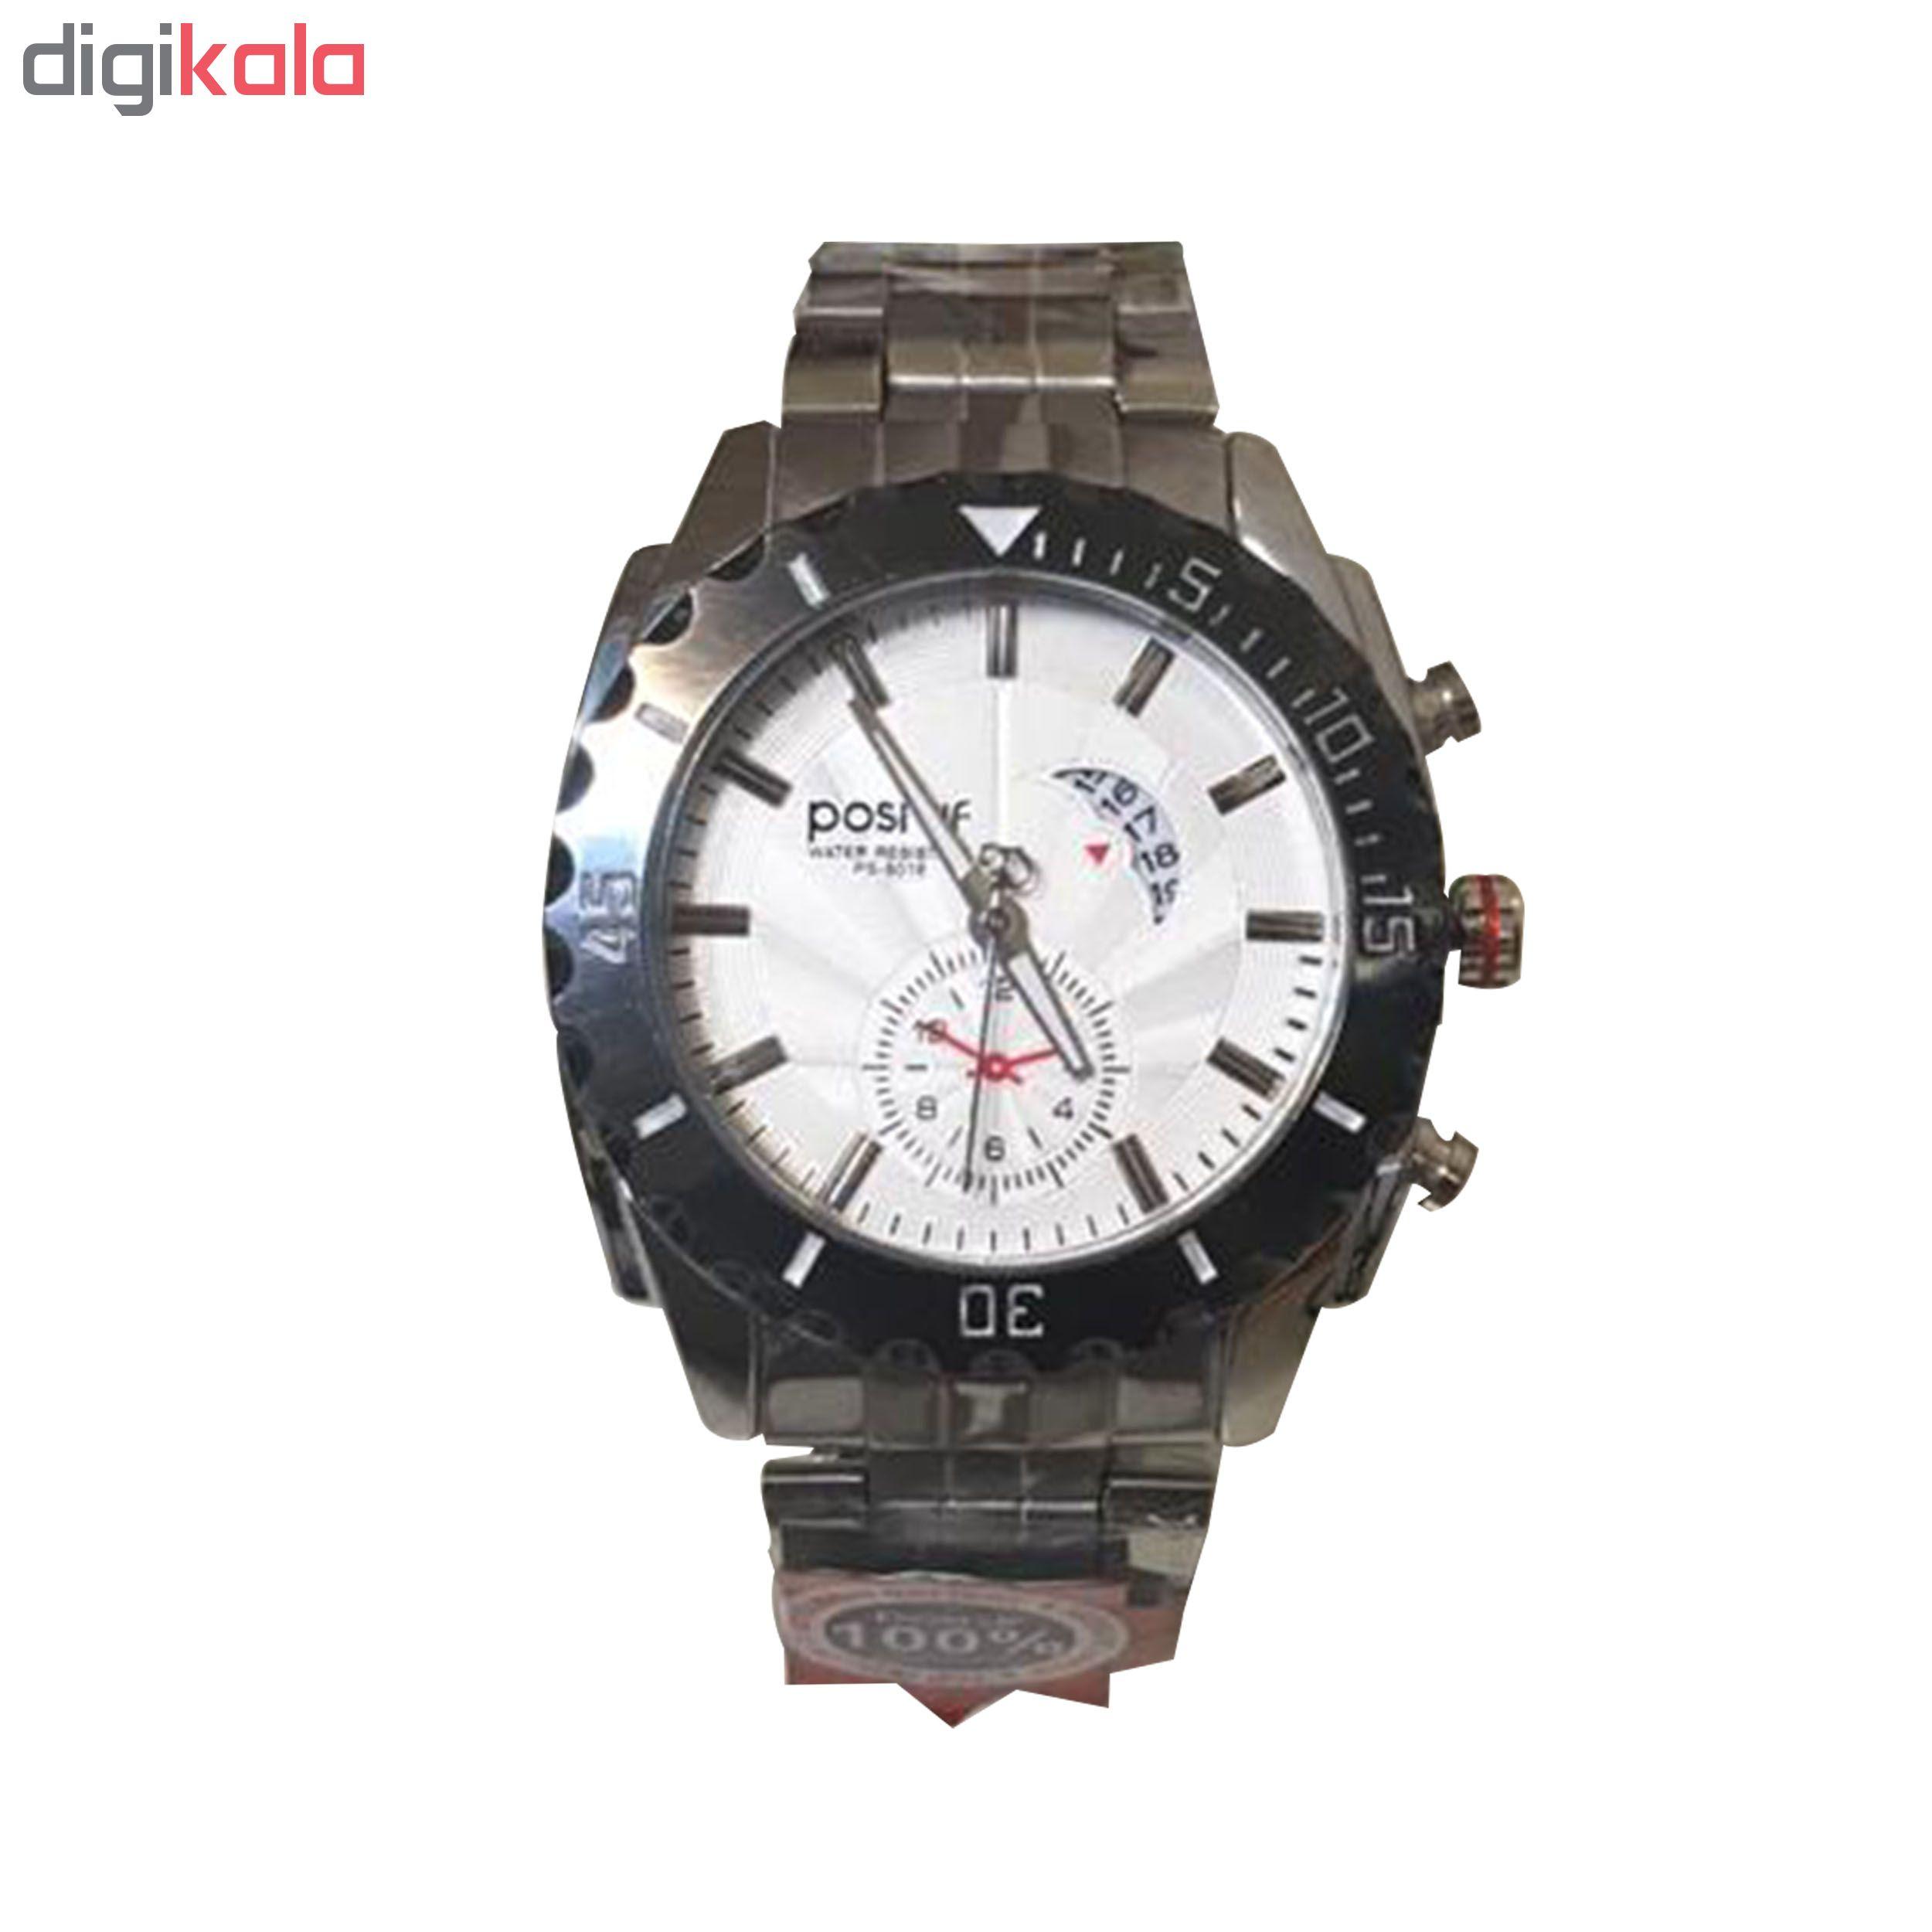 خرید ساعت مچی عقربه ای مردانه پوستیف کد ps.8016